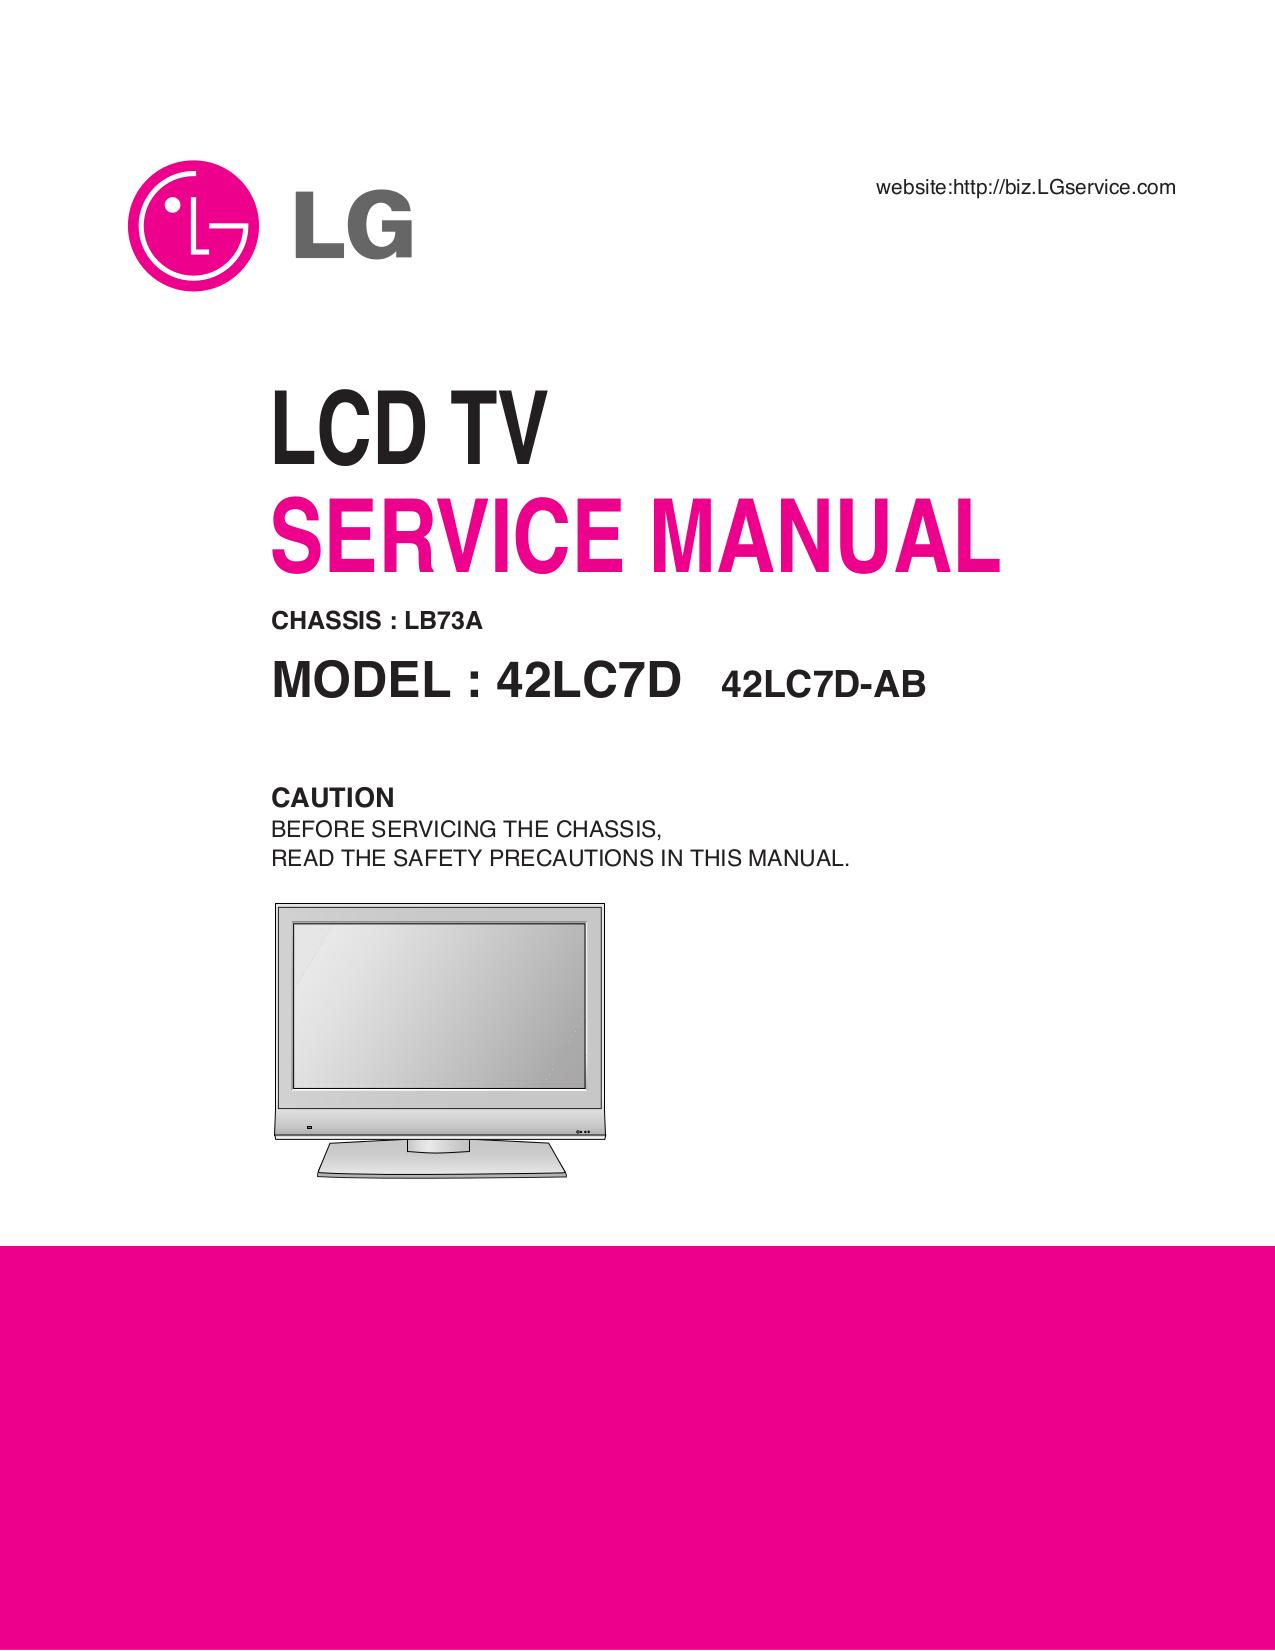 download free pdf for lg 42lc7d tv manual rh umlib com lg tv 32lc7d owner's manual LG Touch Phone Operating Manual